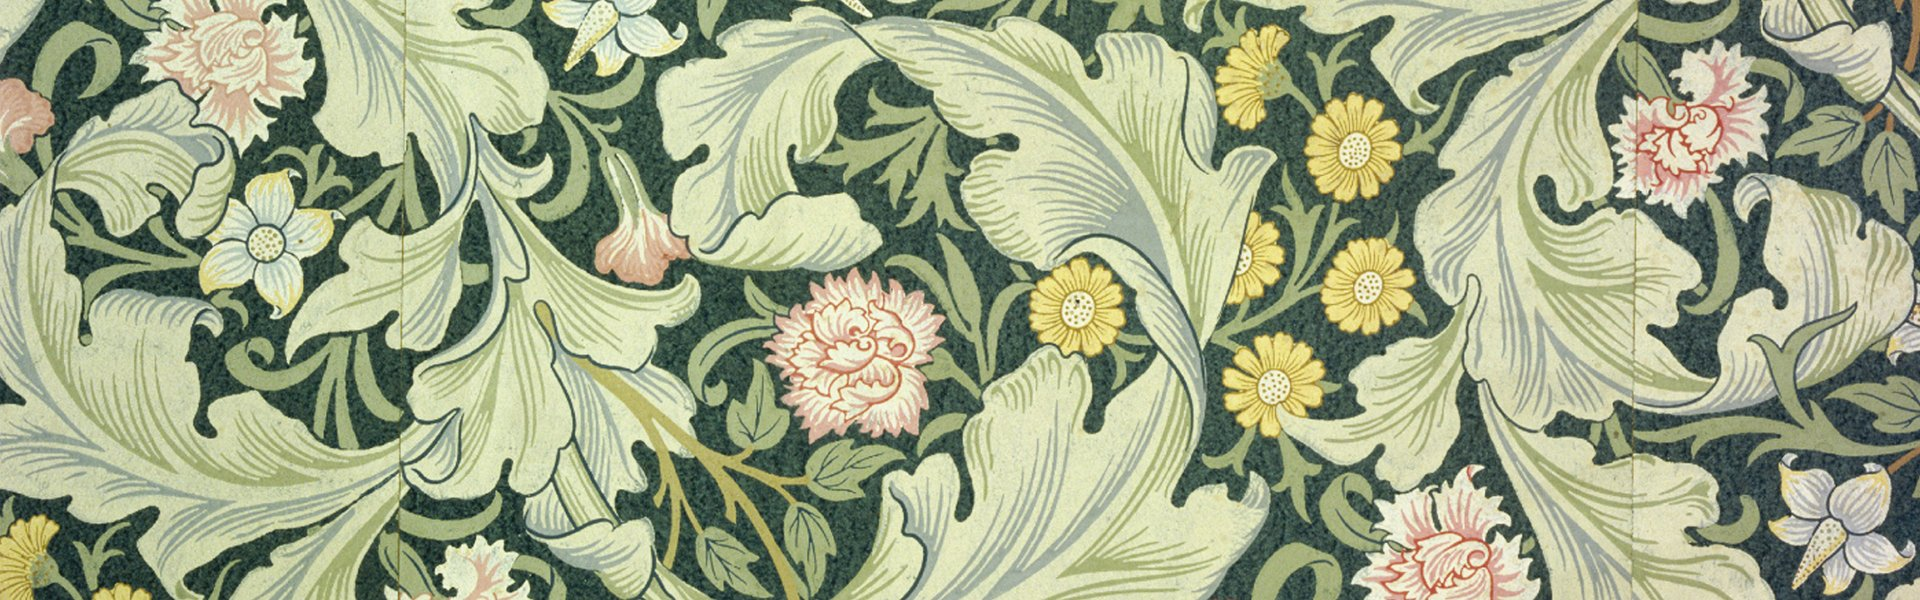 Behang naar ontwerp van William Morris, Groot-Brittannië